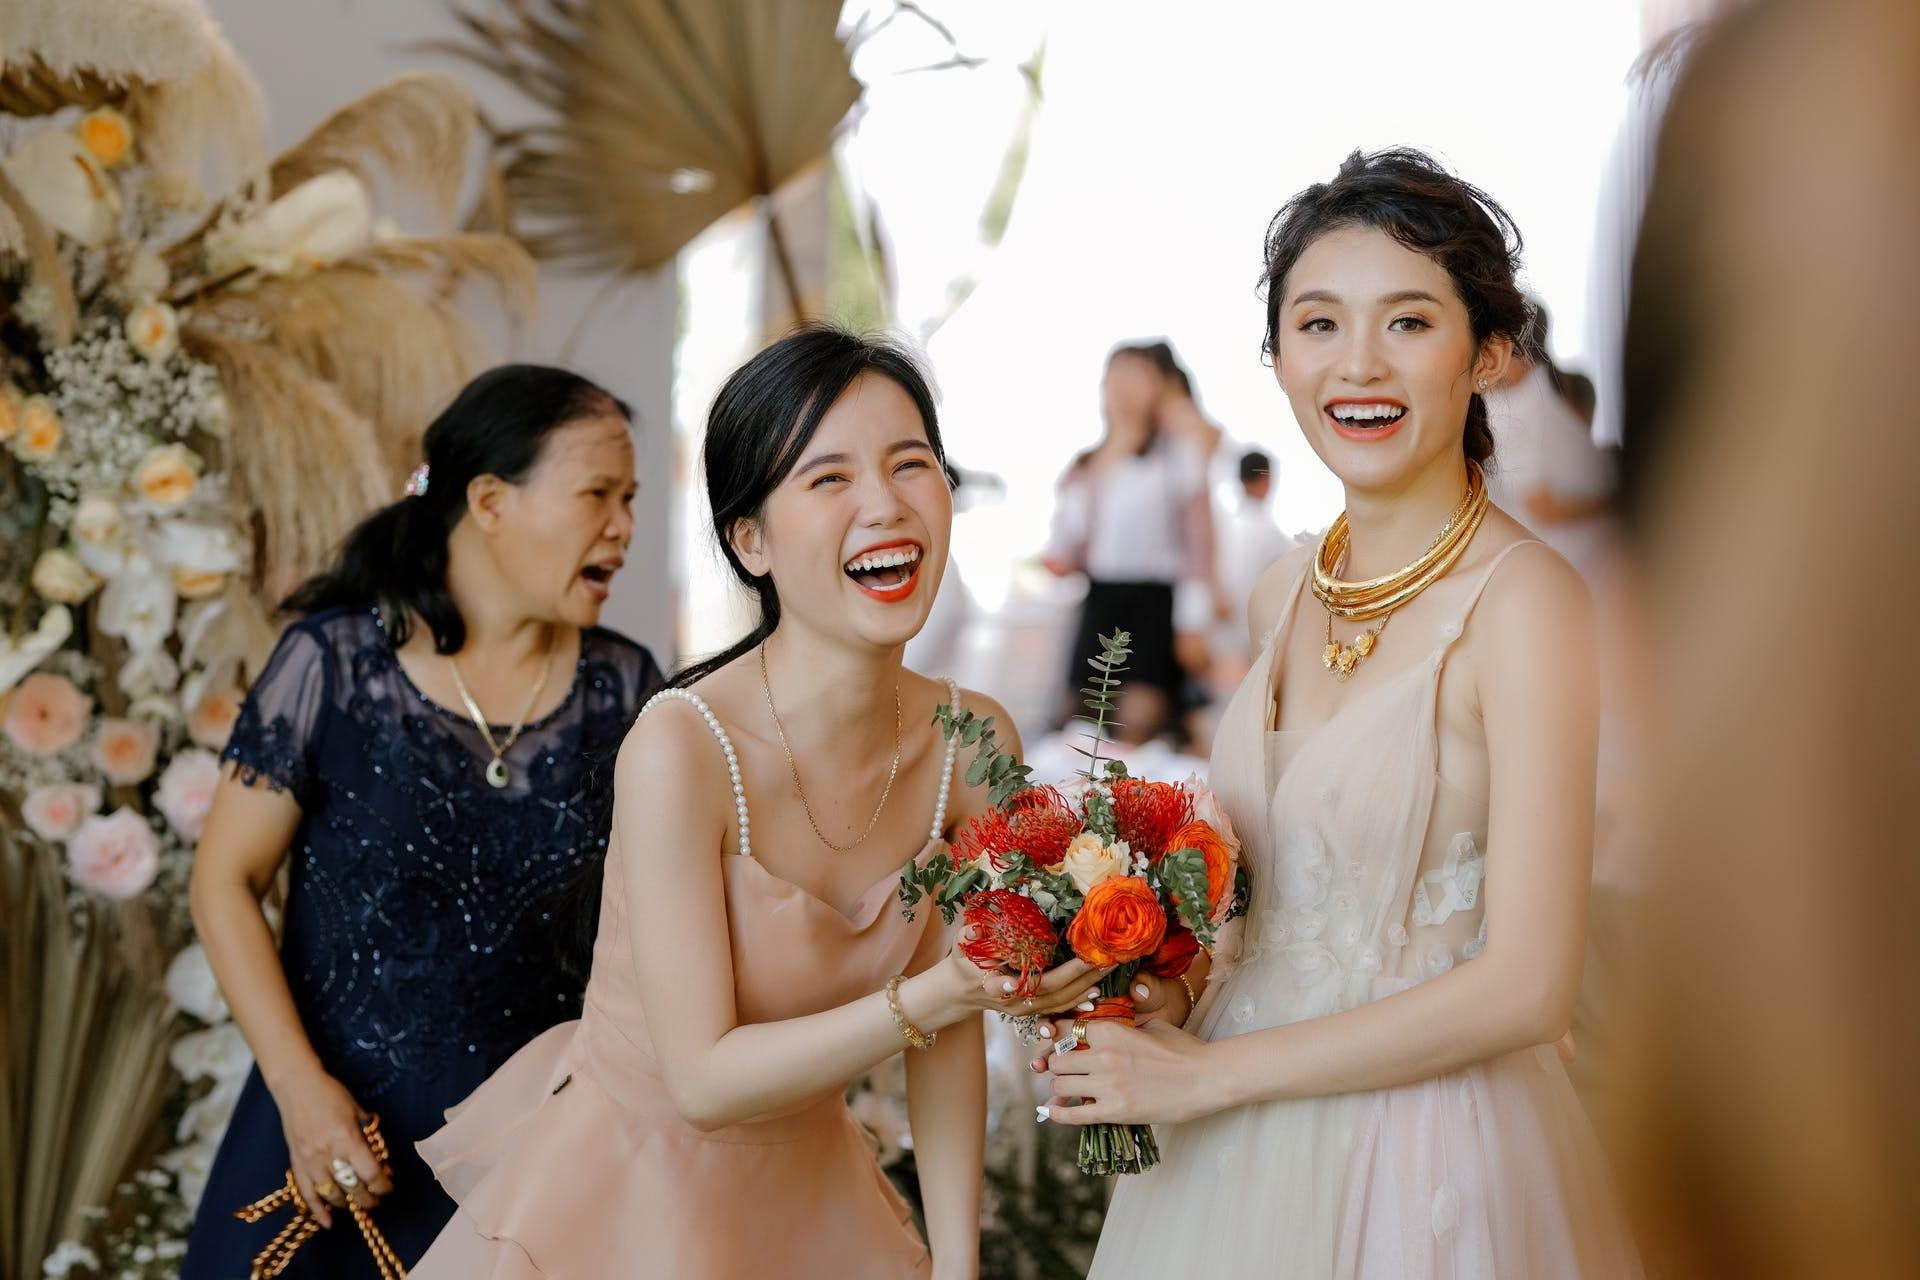 Wedding-Dresses-2645